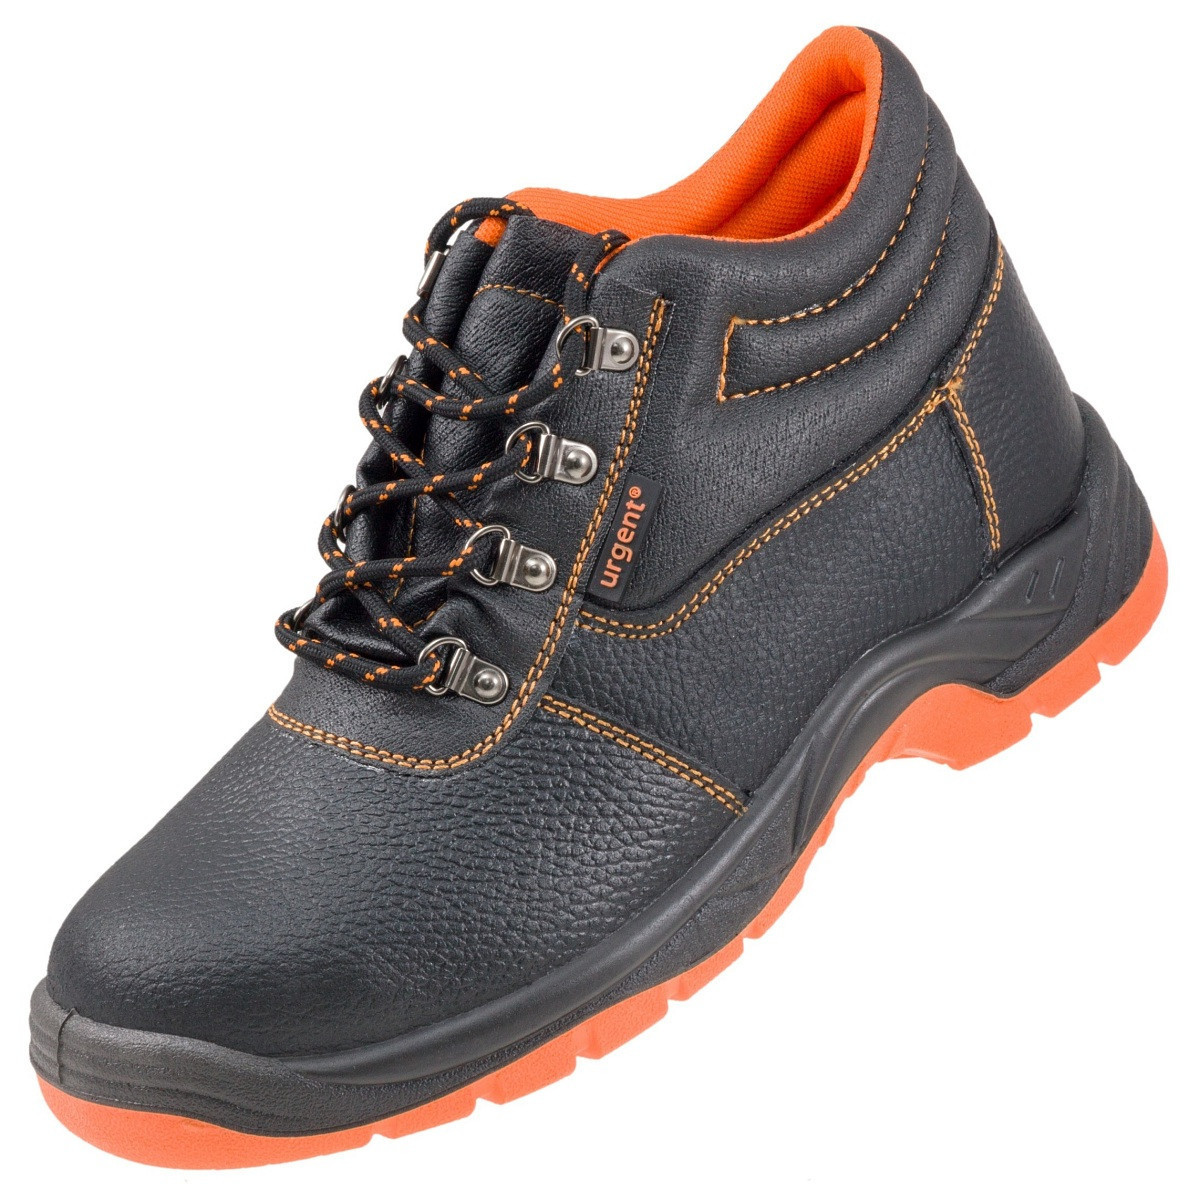 Ботинки 101 S1P с металлическим носком,антистатические URGENT (POLAND)